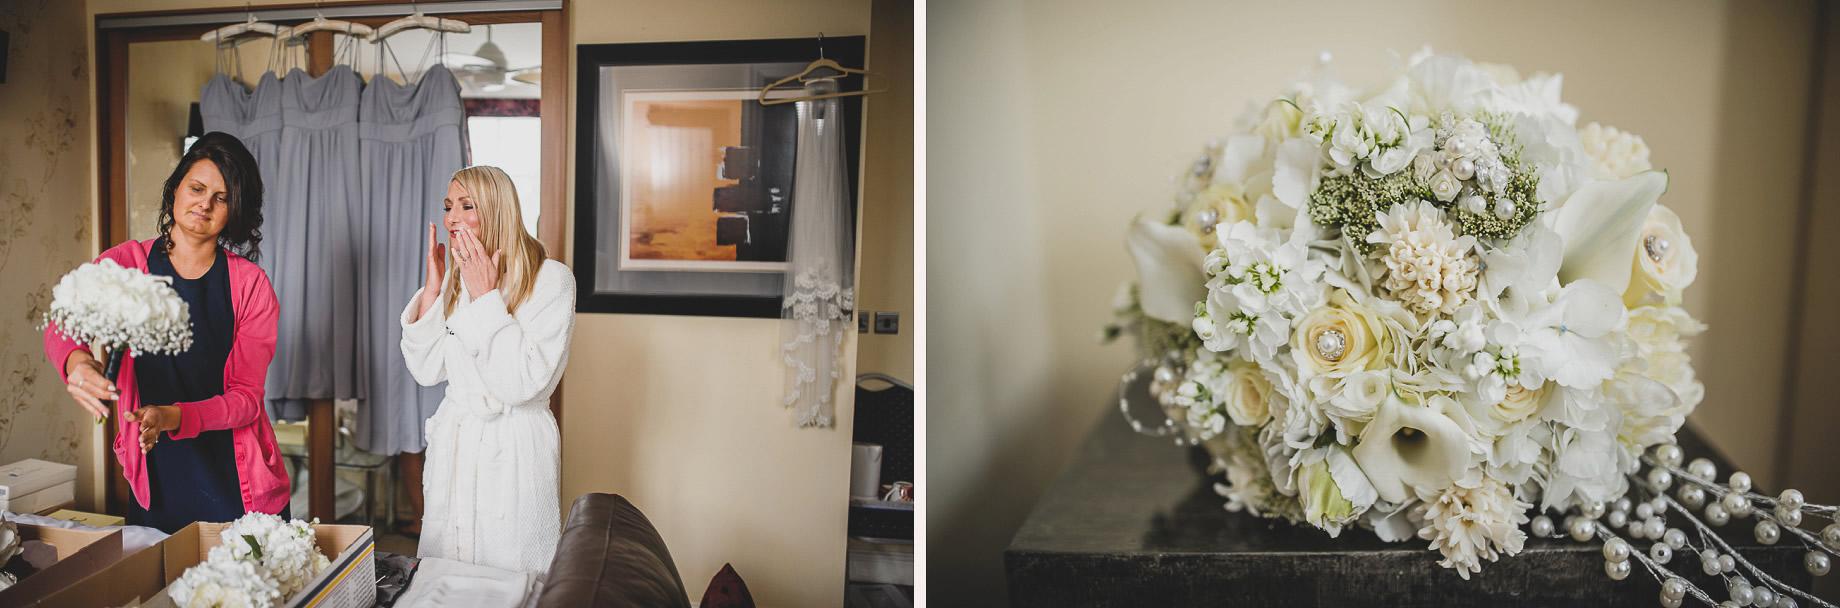 Rachel and Christian's Wedding at Holland Hall Hotel 012